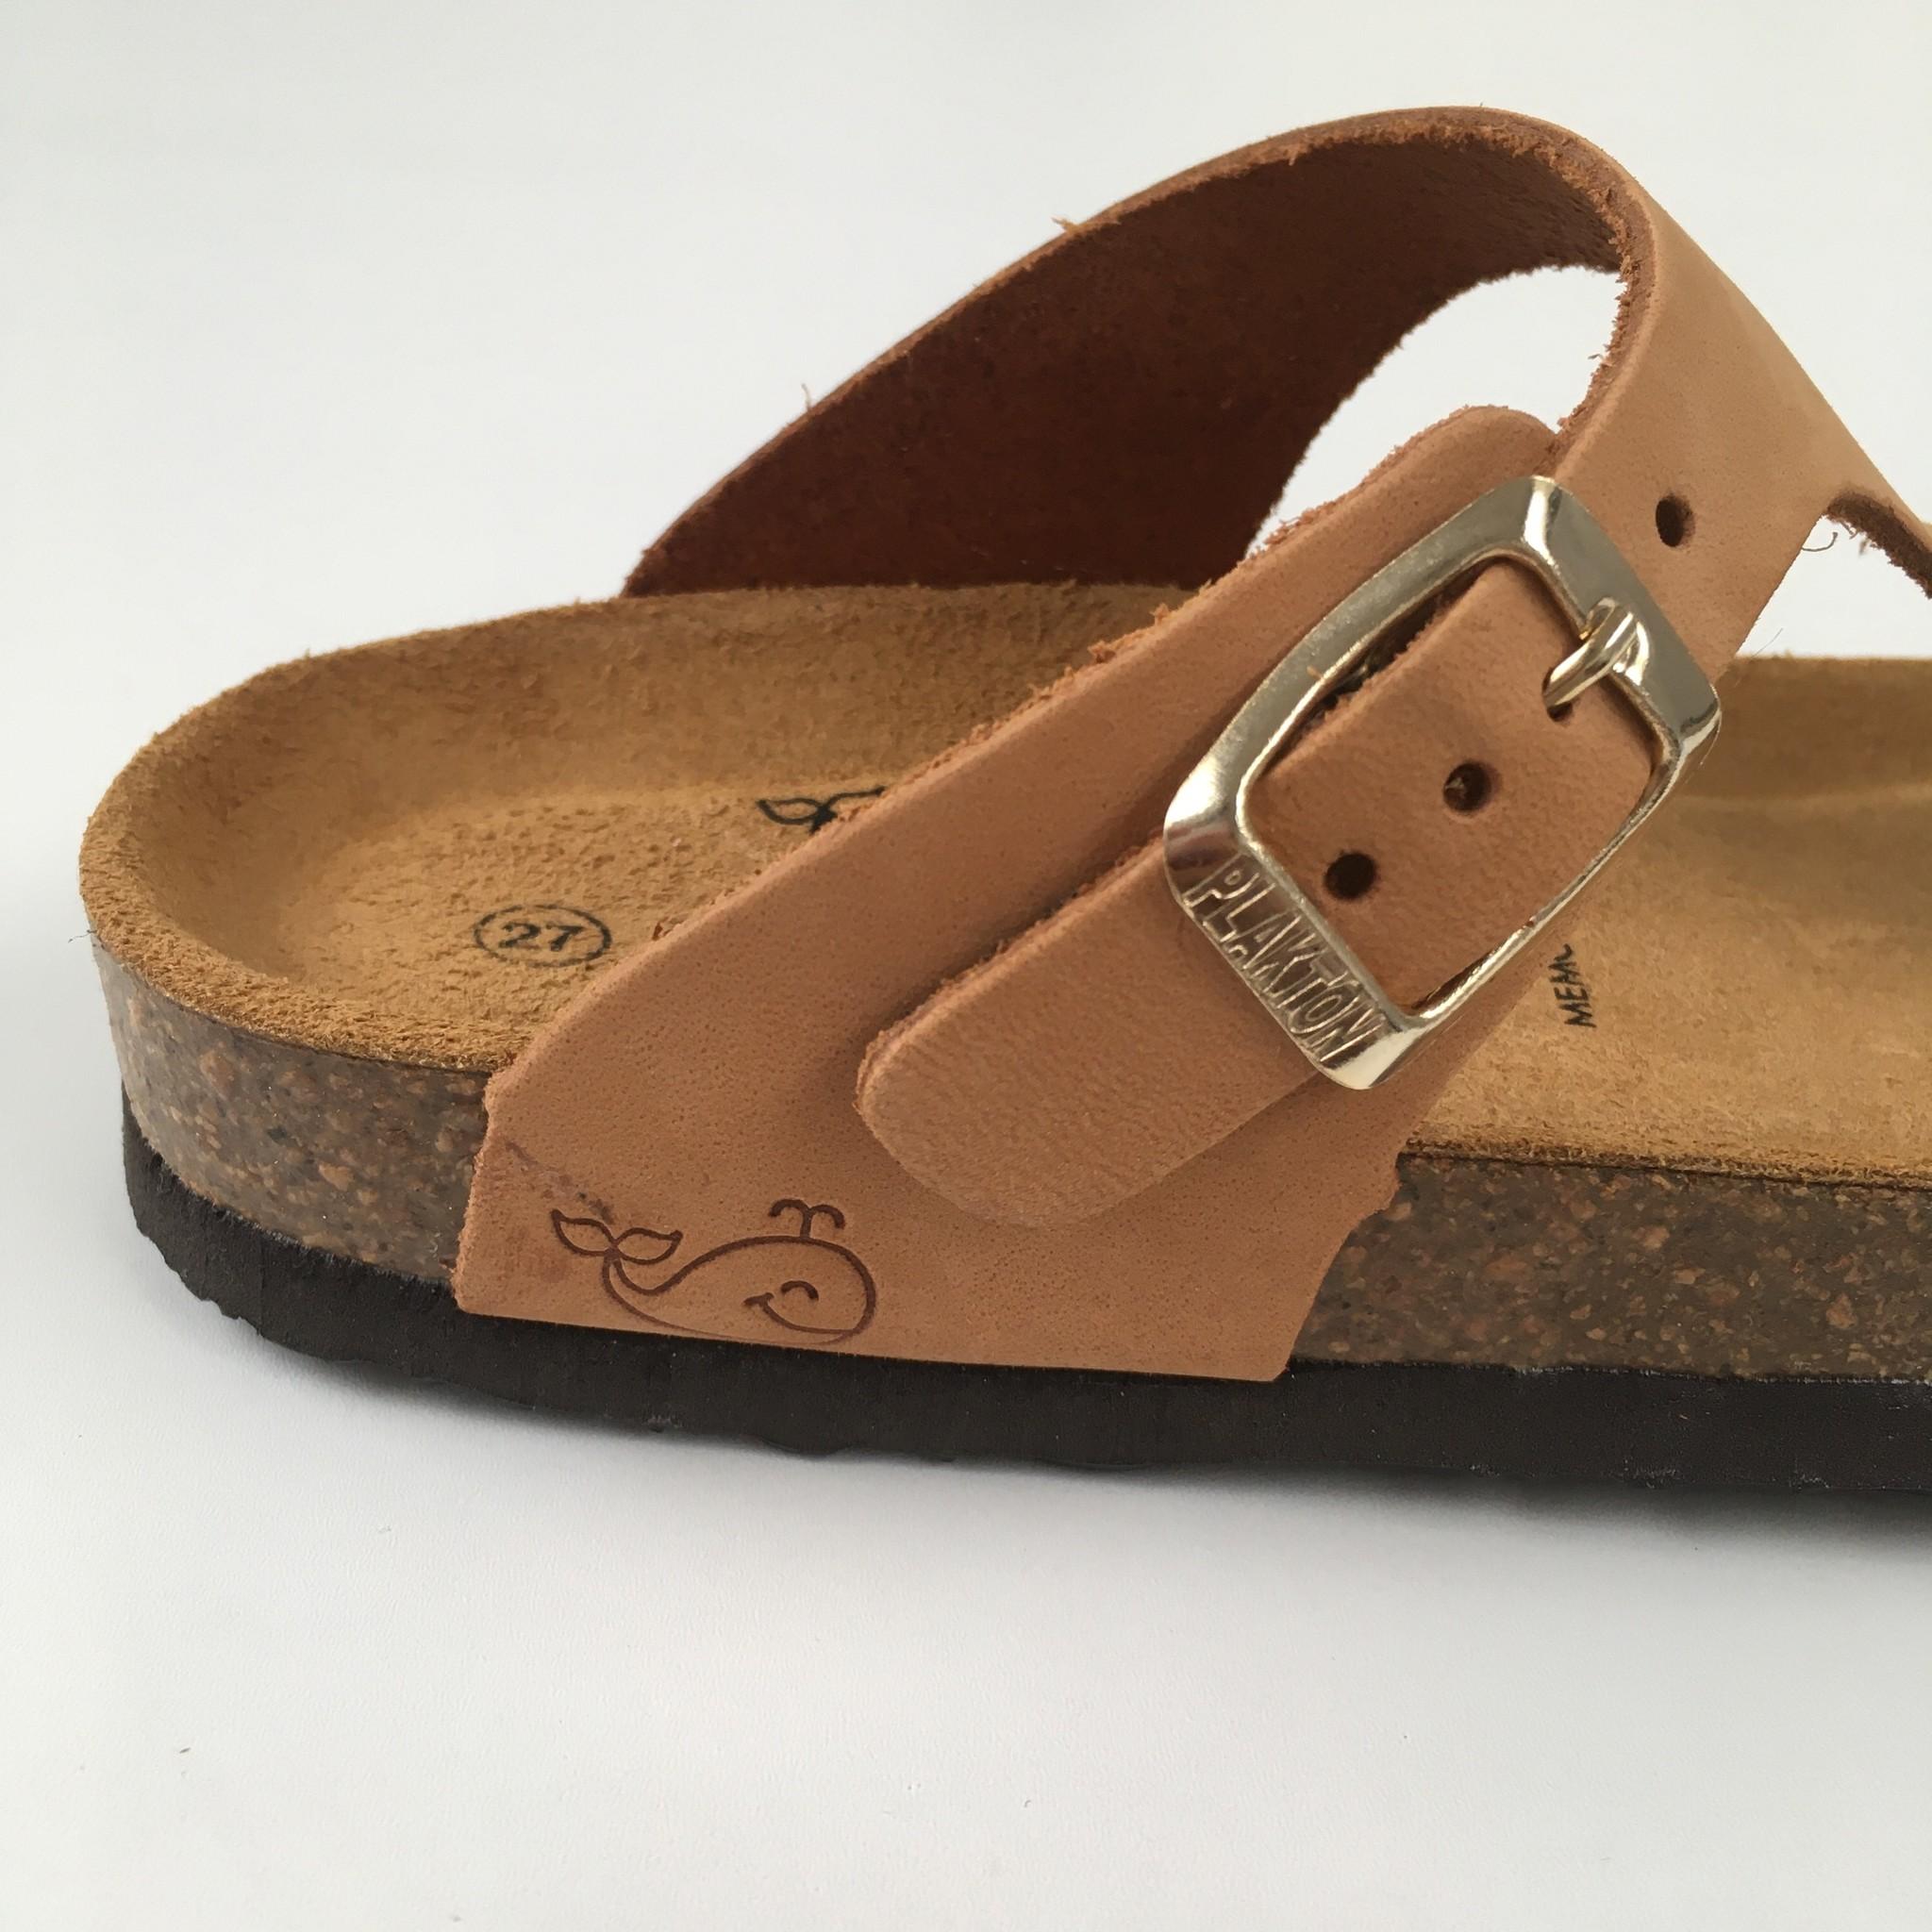 PLAKTON SANDALS leather children's slipper cork BOLERO - nubuck leather sand color beige - 24 to 34